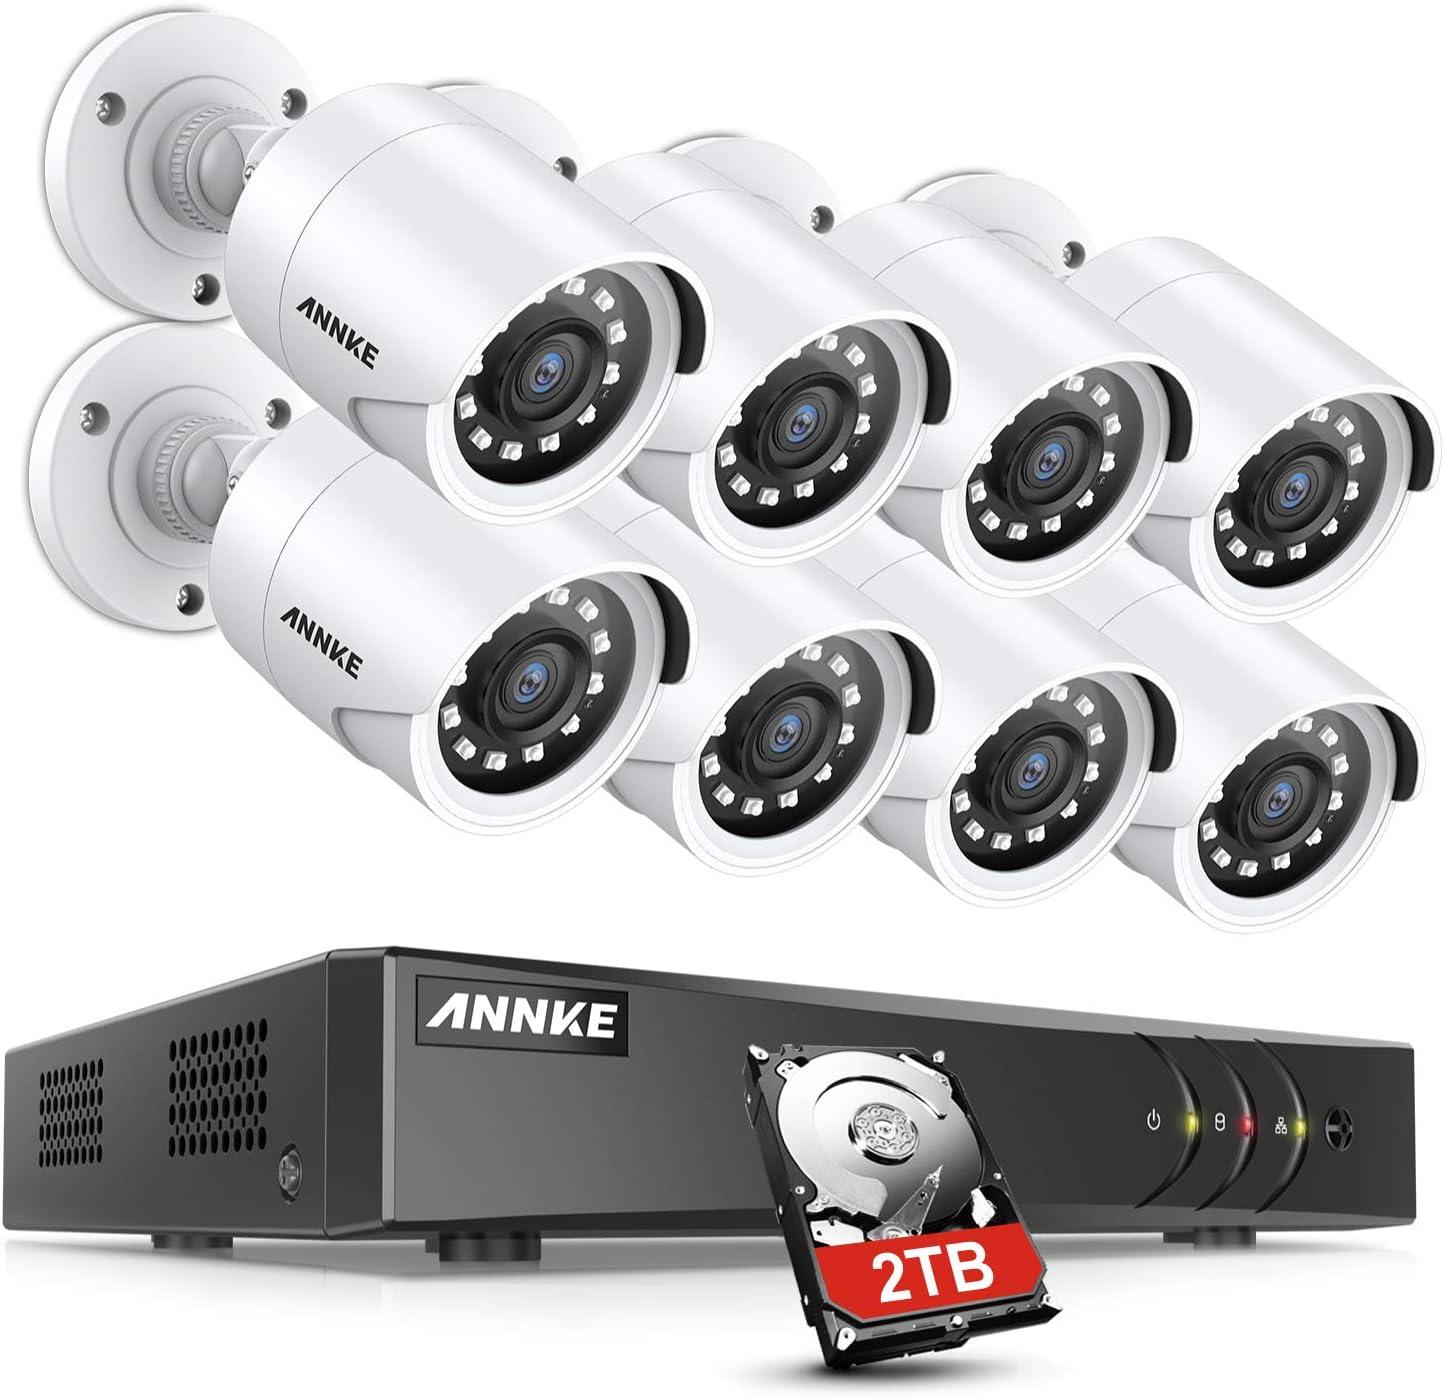 ANNKE Sistema de Seguridad 8 1080P Cámaras de Vigilancia CCTV 2MP, Onvif H.265+ DVR P2P 8CH TVI IP66 Impermeable 36 IR Leds -2TB Disco Duro